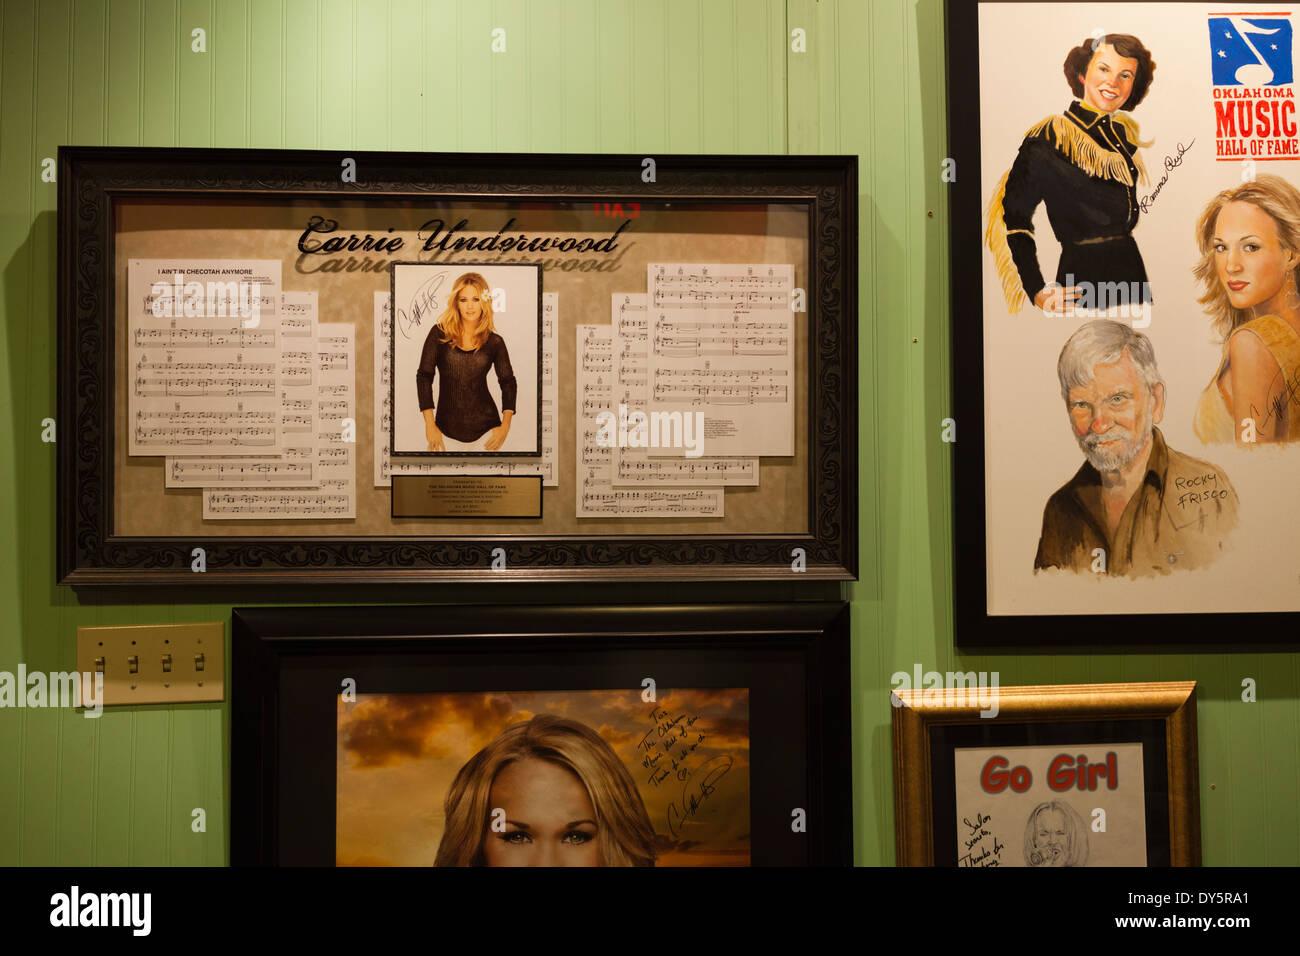 USA, Oklahoma, Muskogee, Oklahoma Music Hall of Fame, display on Carrie Underwood, Oklahoma-born country music superstar Stock Photo